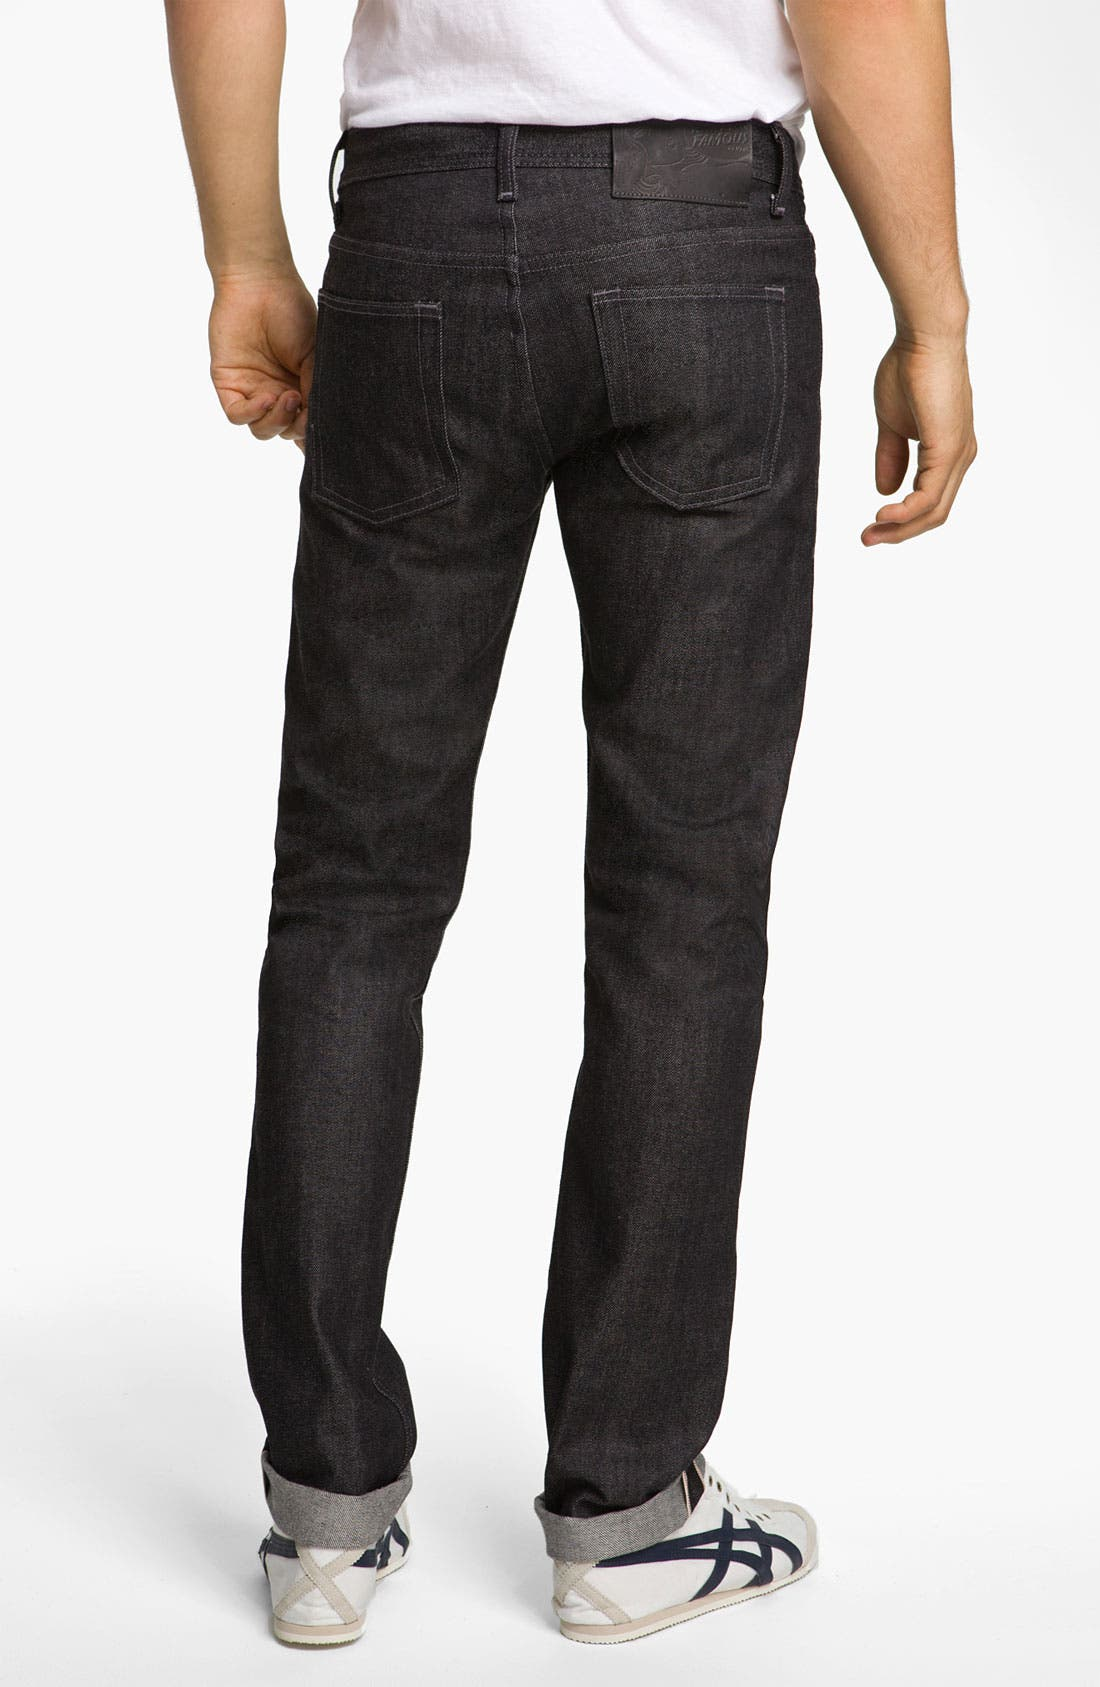 Main Image - Naked & Famous Denim 'Weird Guy' Slim Fit Selvedge Jeans (Black)